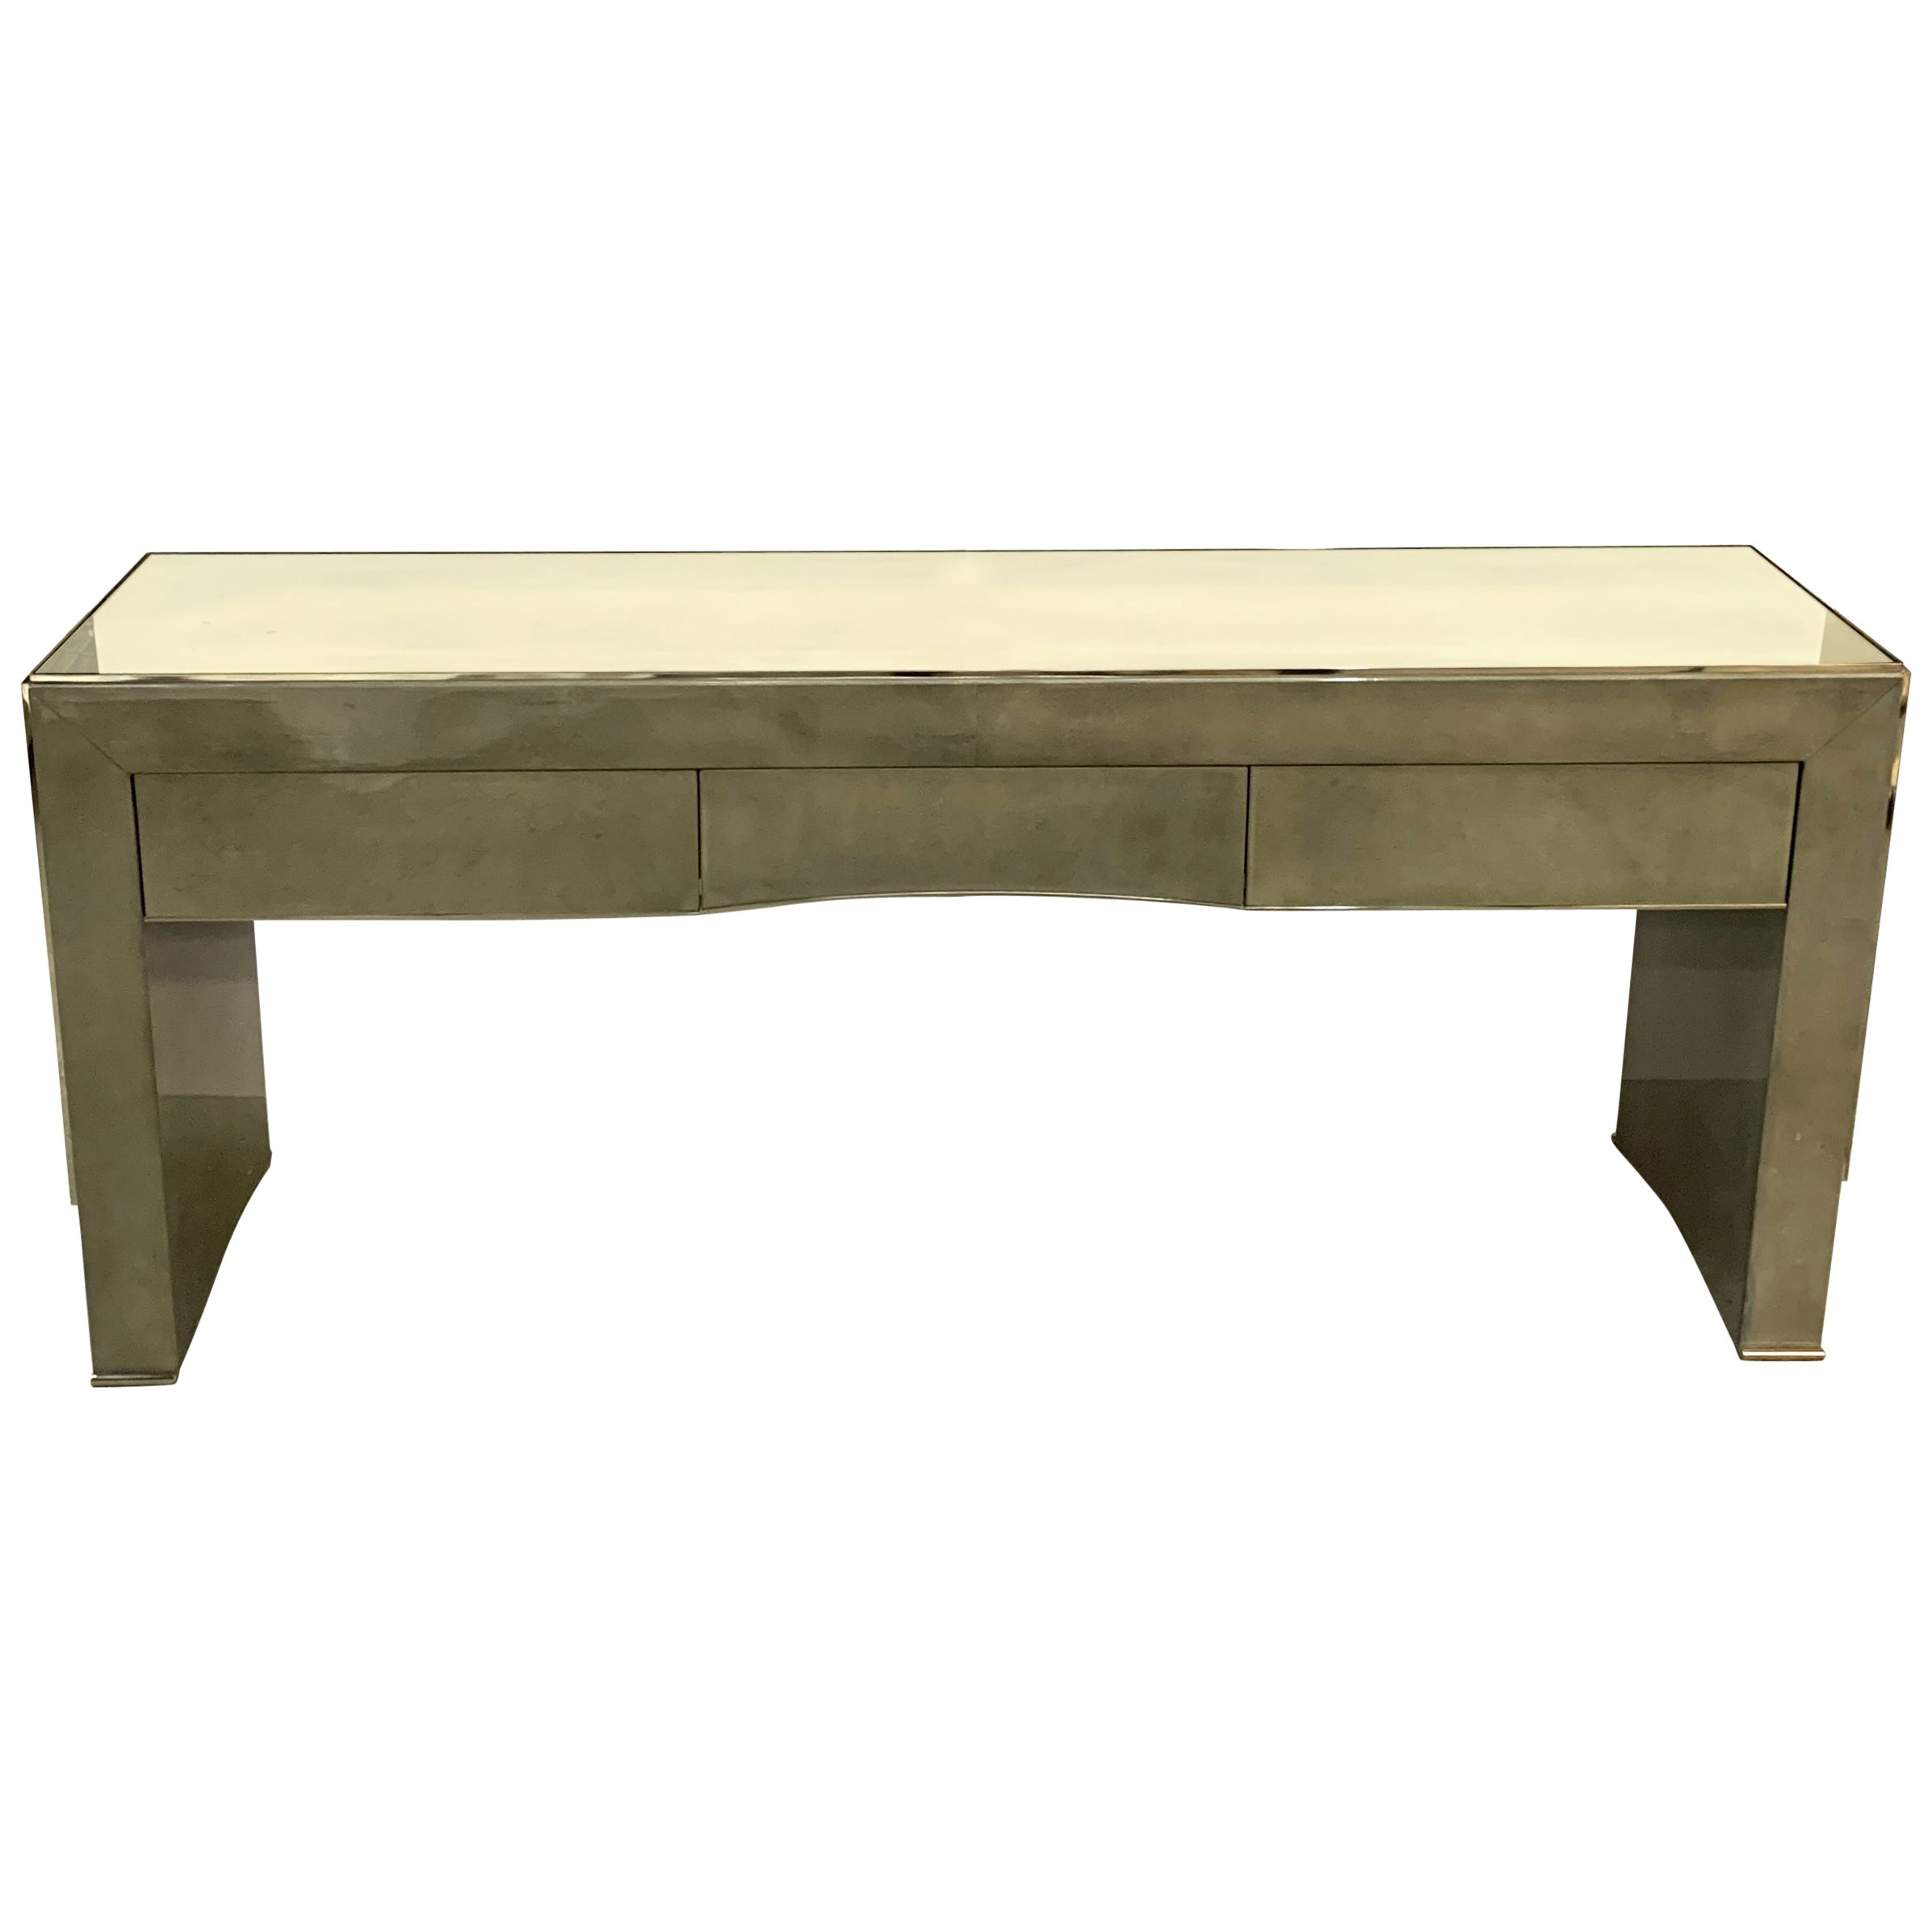 Wonderful Mid-Century Modern Pastel Soft Goat Skin Mirrored Nickel Console Table